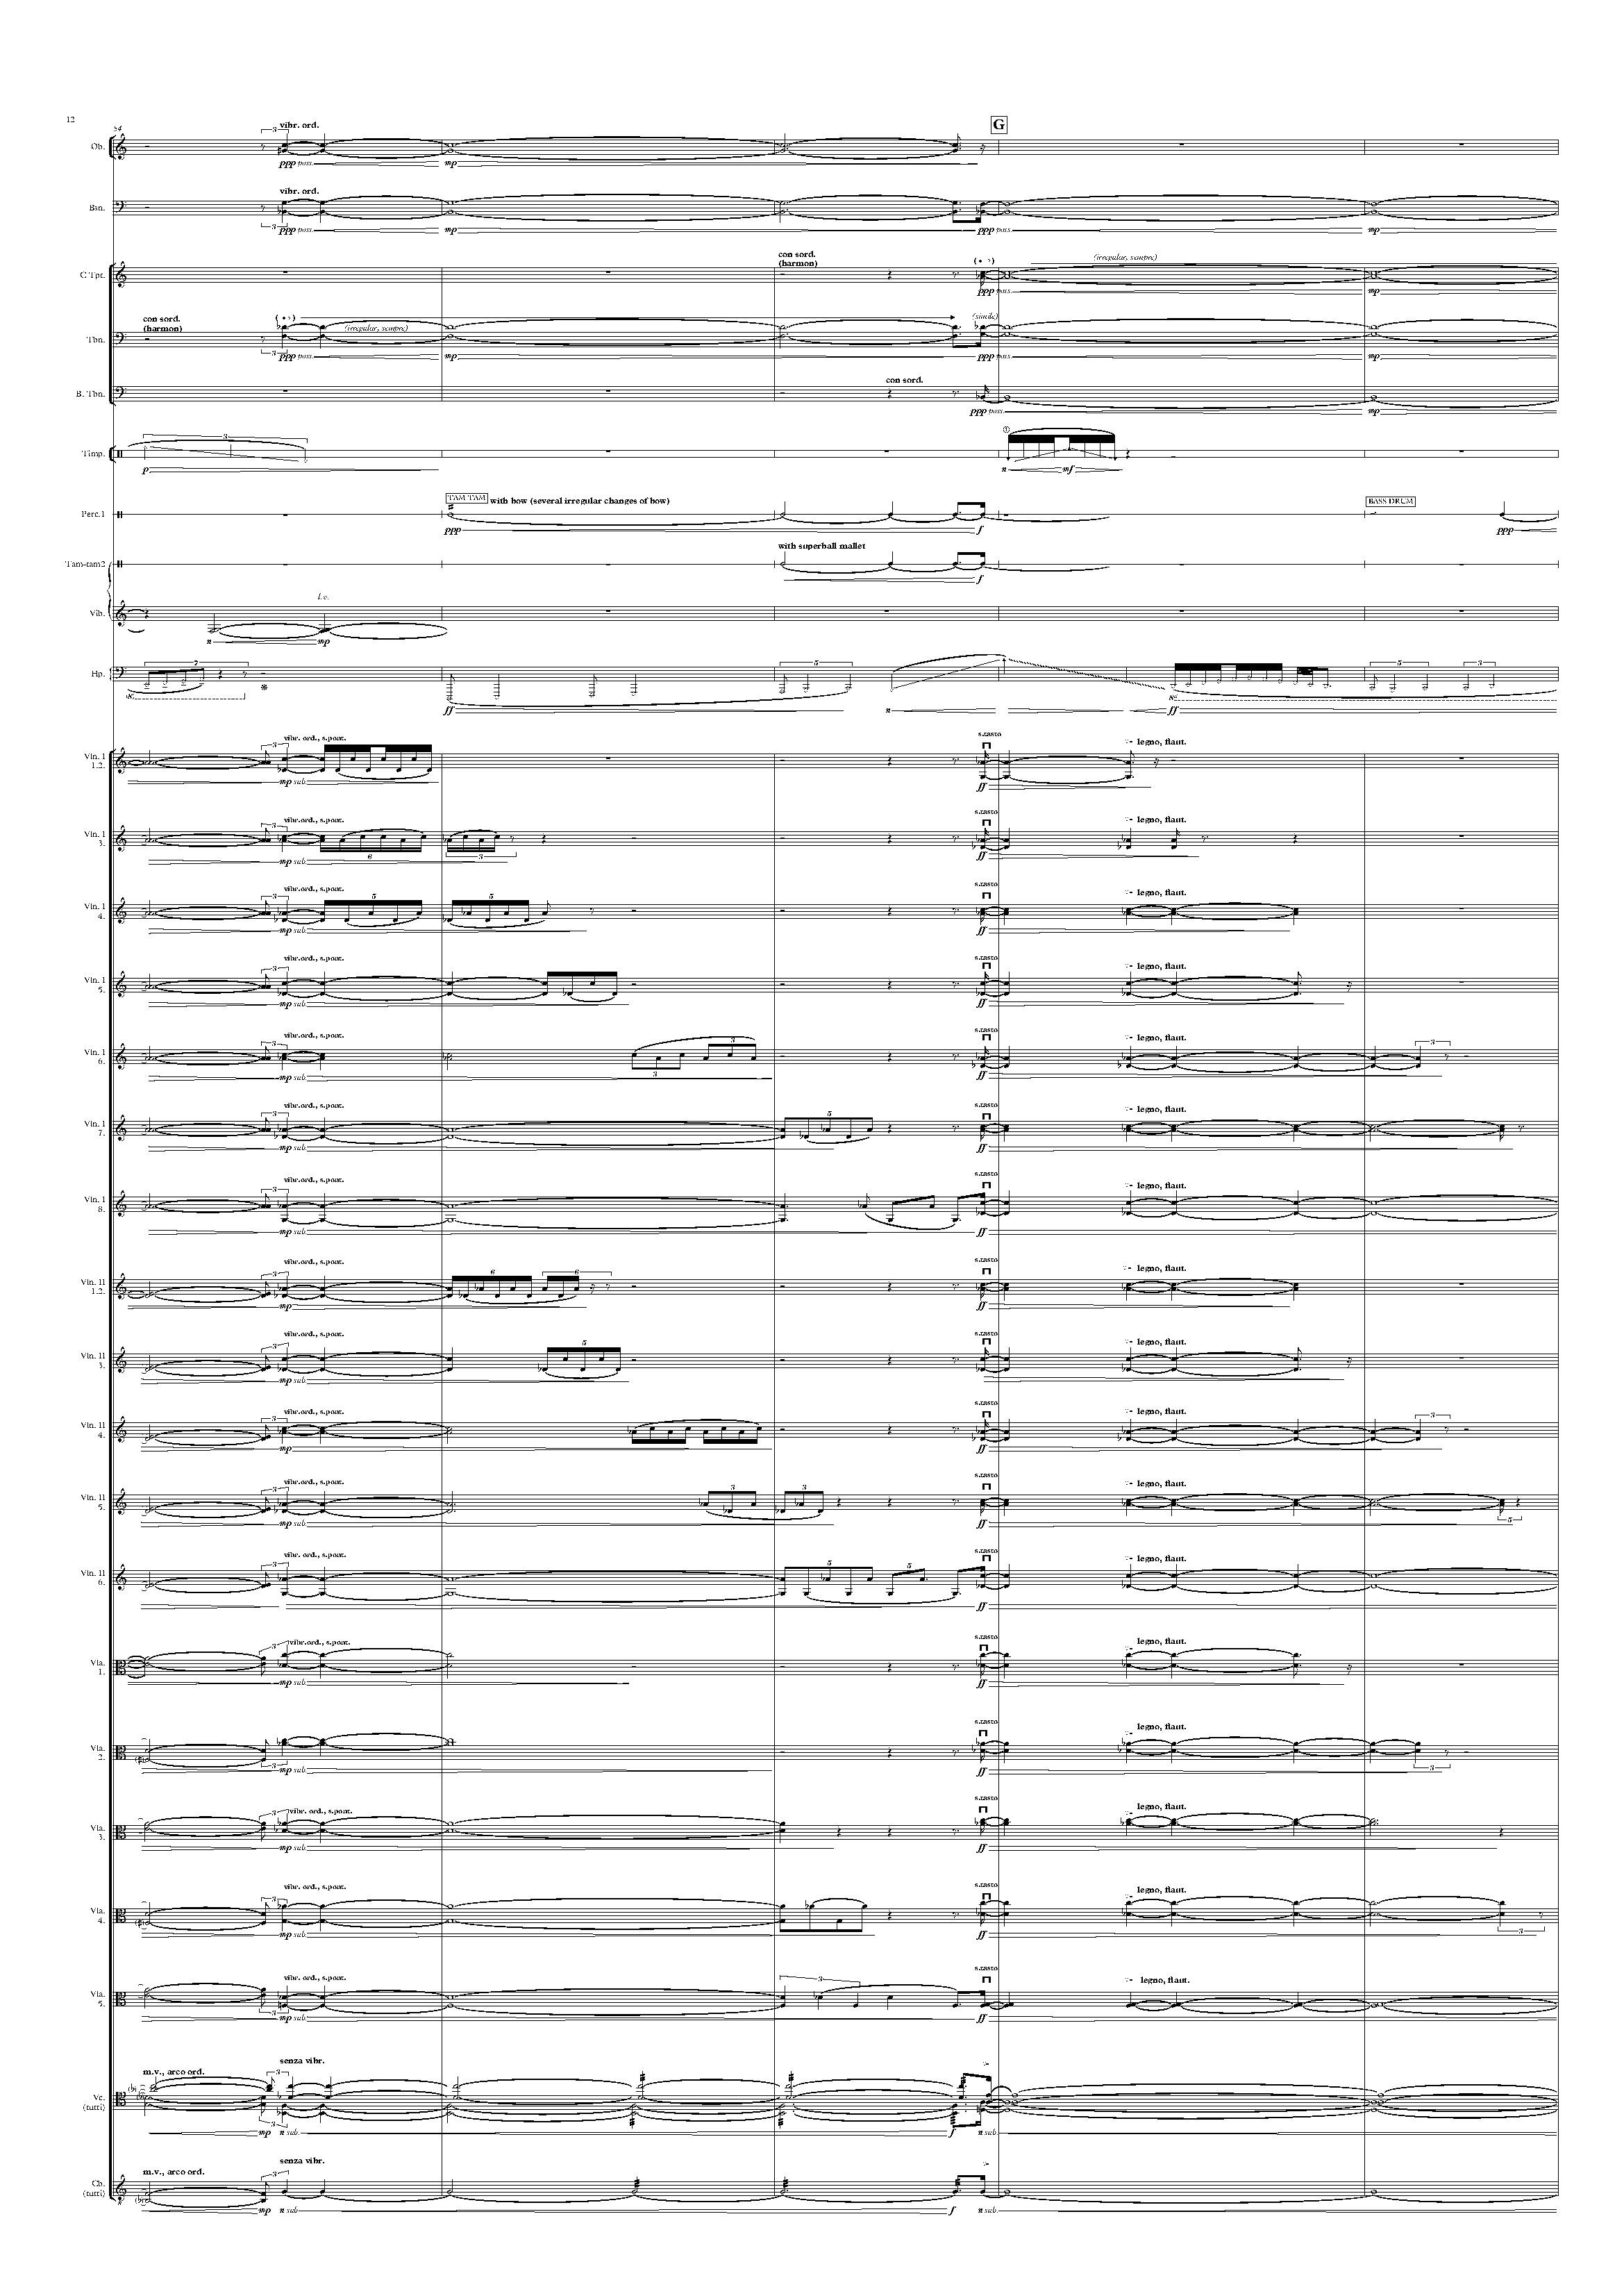 Plage des amours -Sérgio Rodrigo - Full Score_Seite_12.jpg